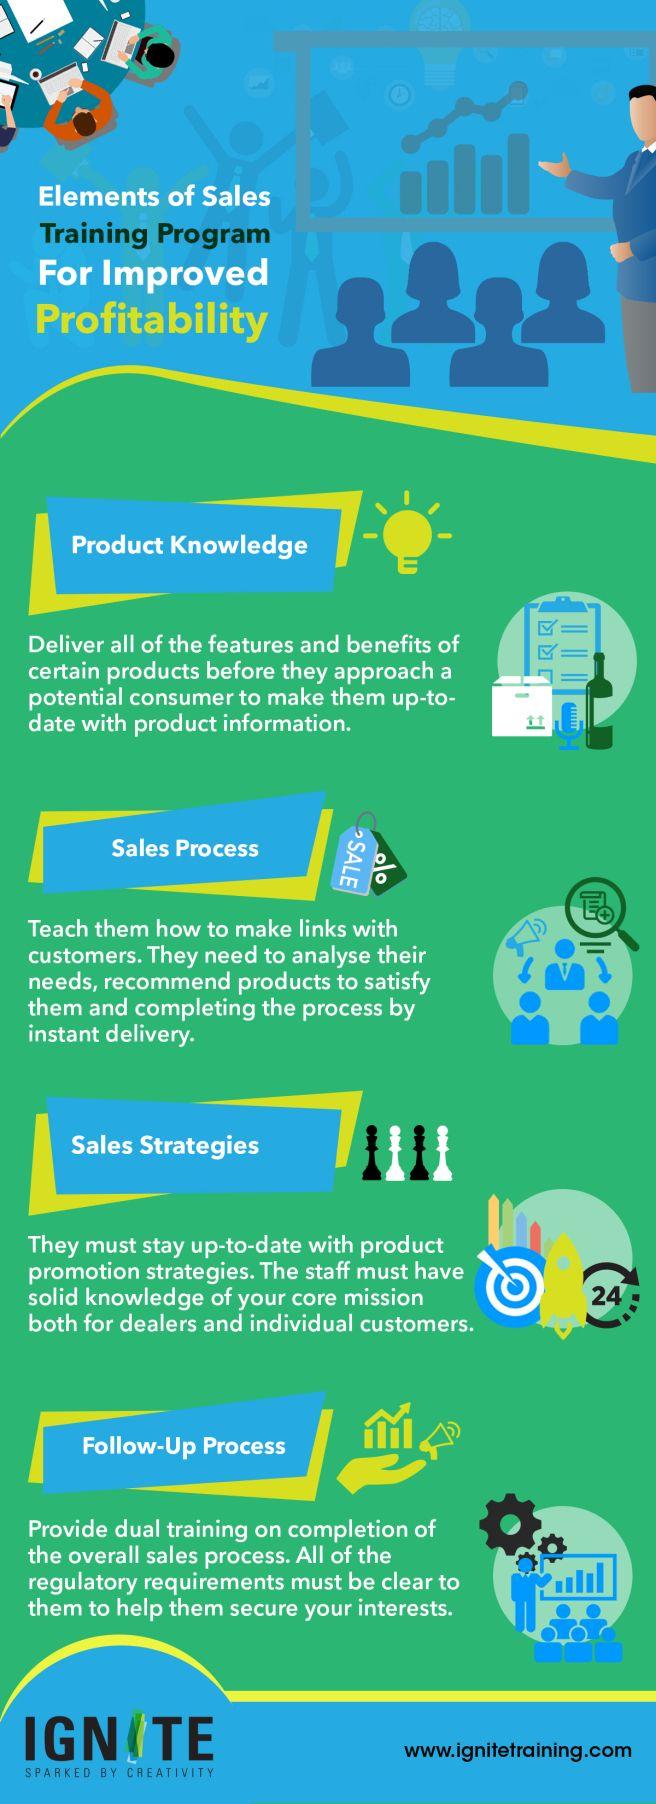 Elements Of Sales Training Program For Improved Profitability   Training Companies in Dubai